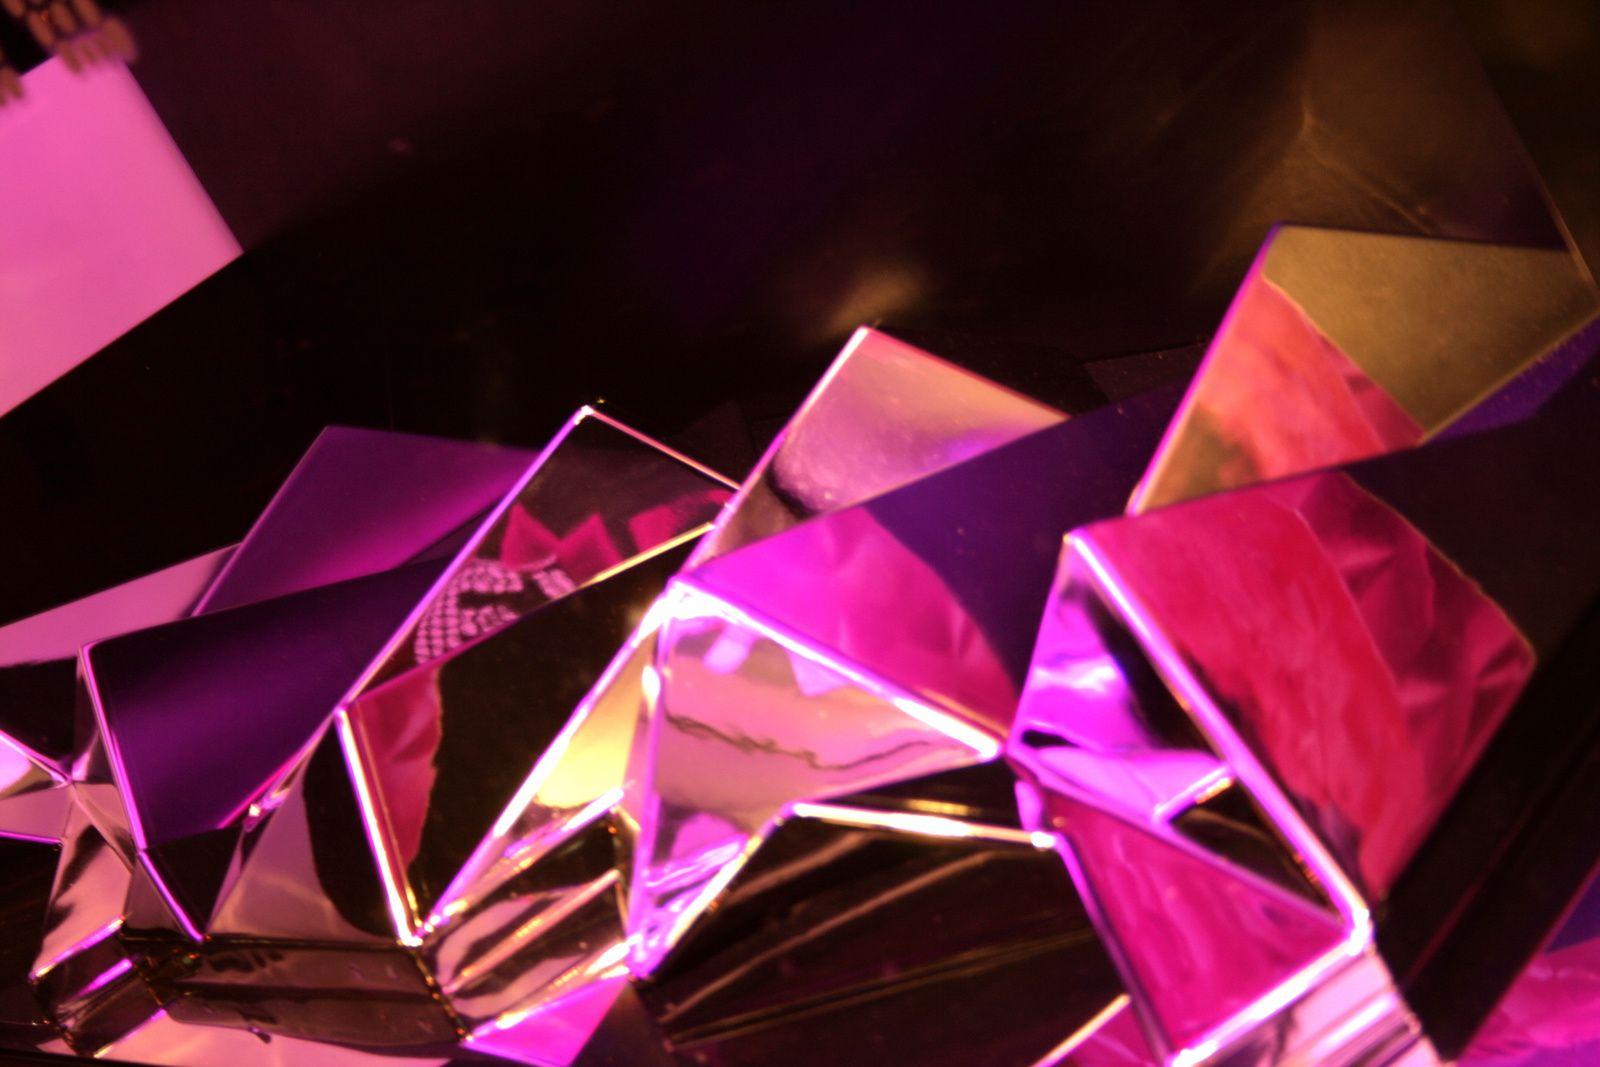 #Prismes #violets #charlotteblabla blog*